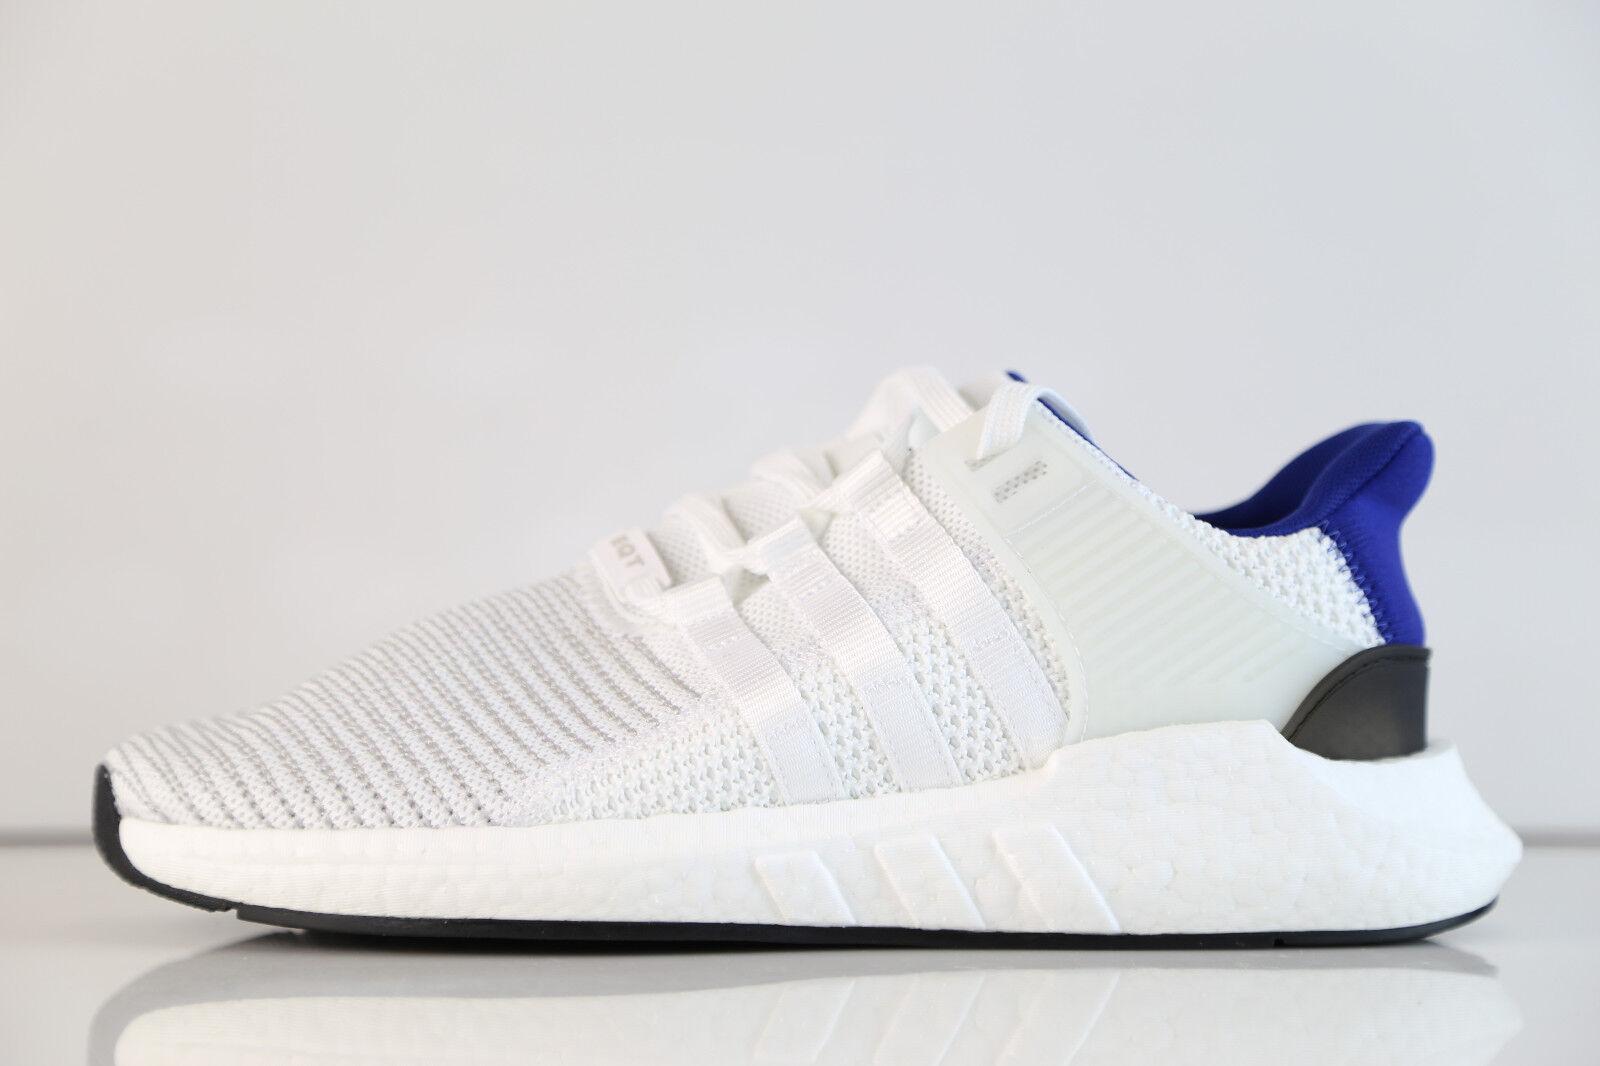 Adidas EQT Support 93/17 Boost White Blue BZ0592 8-12 93 17 ultra originals pk